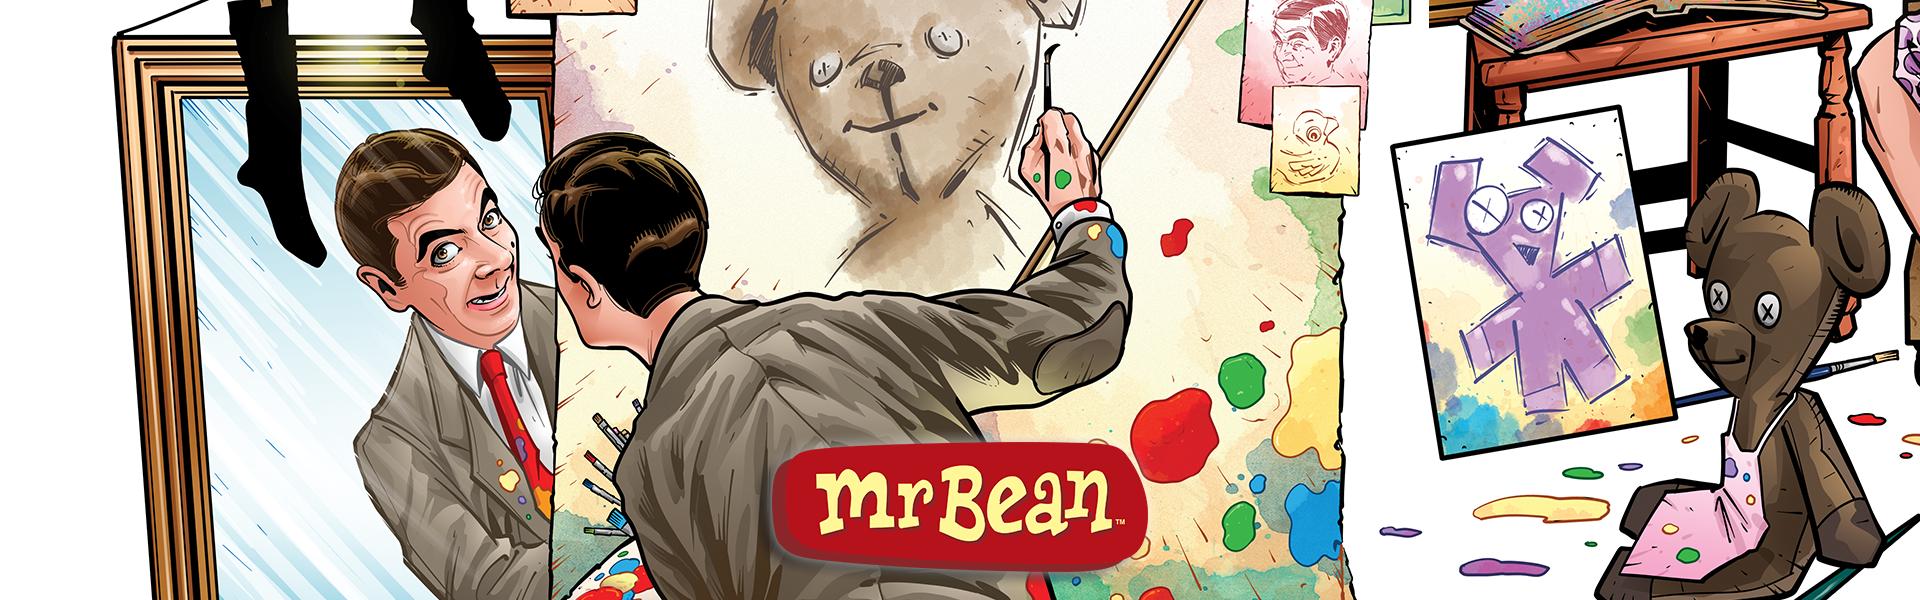 Mr Bean - Dabel Brothers